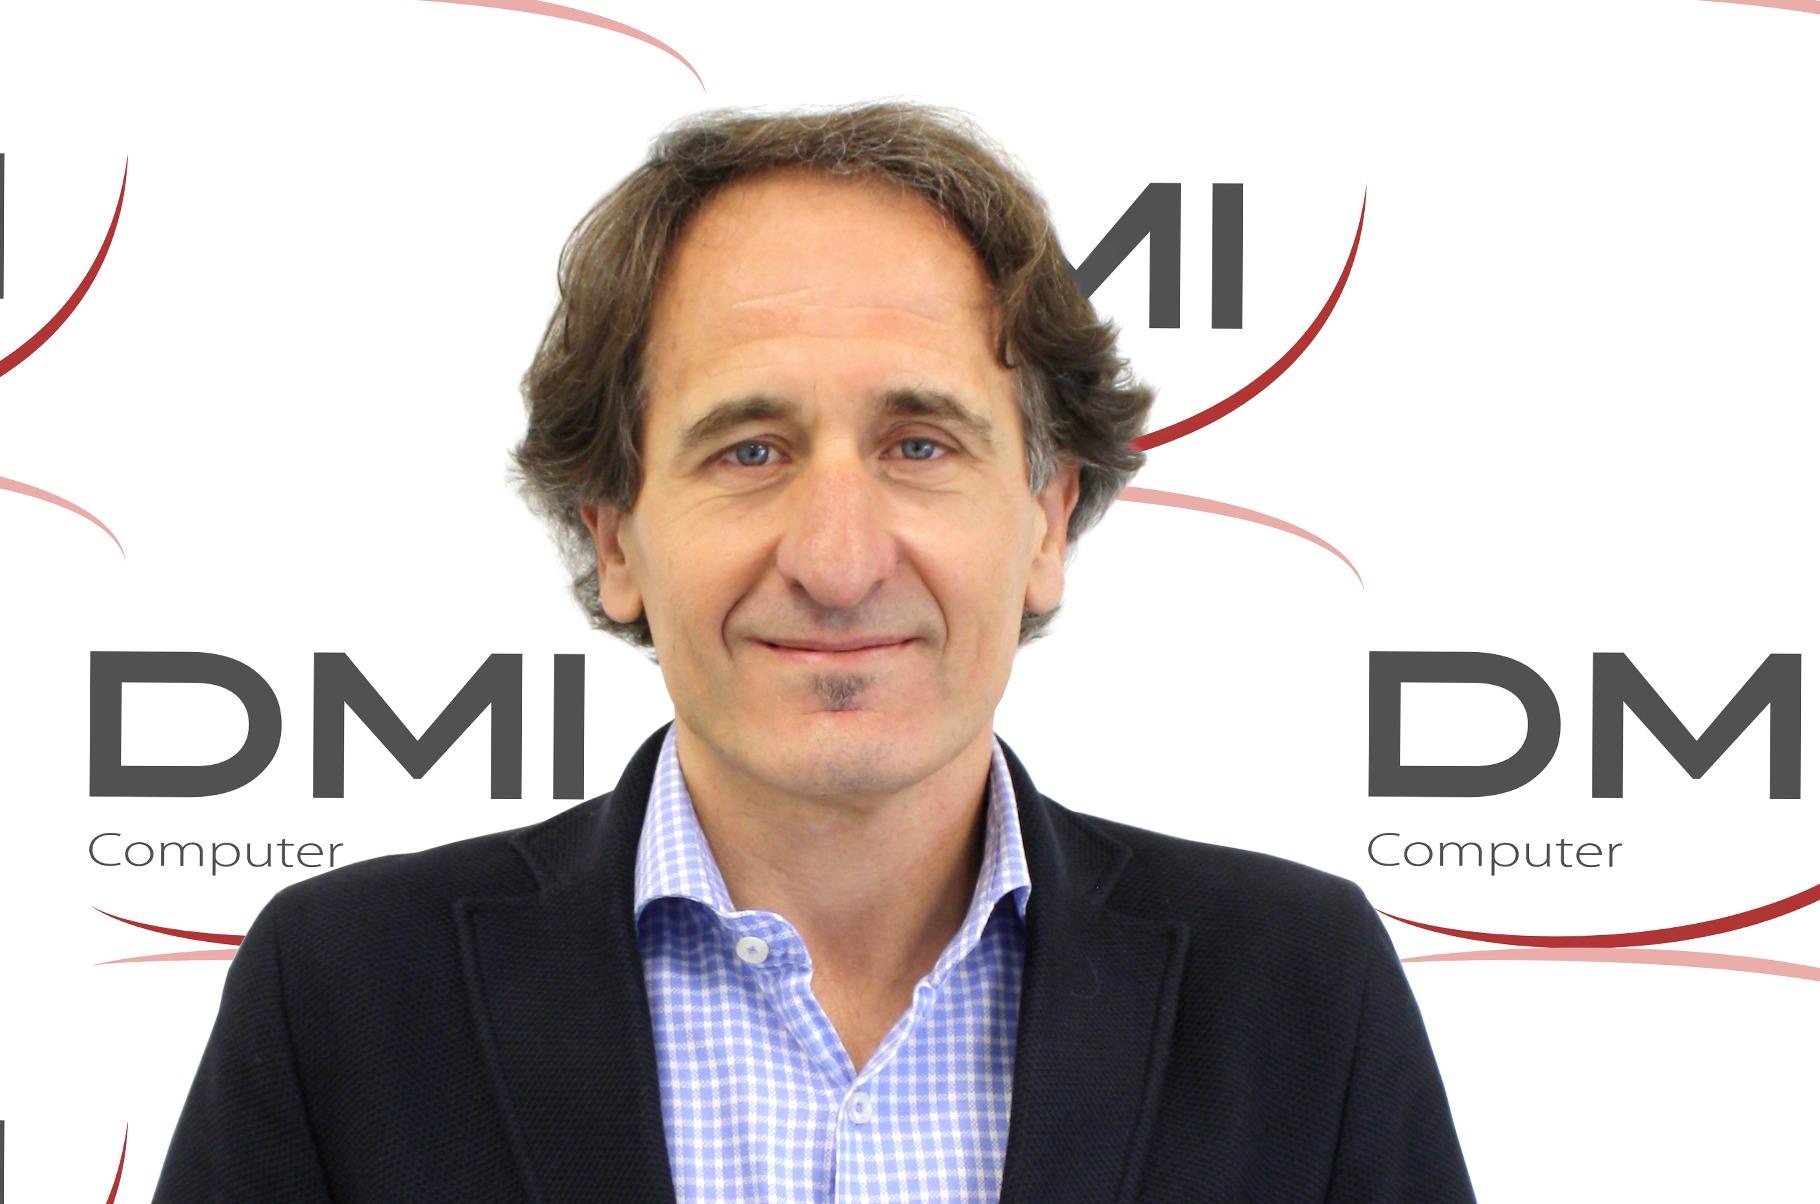 Emilio Sánchez-Clemente, gerente de DMI.